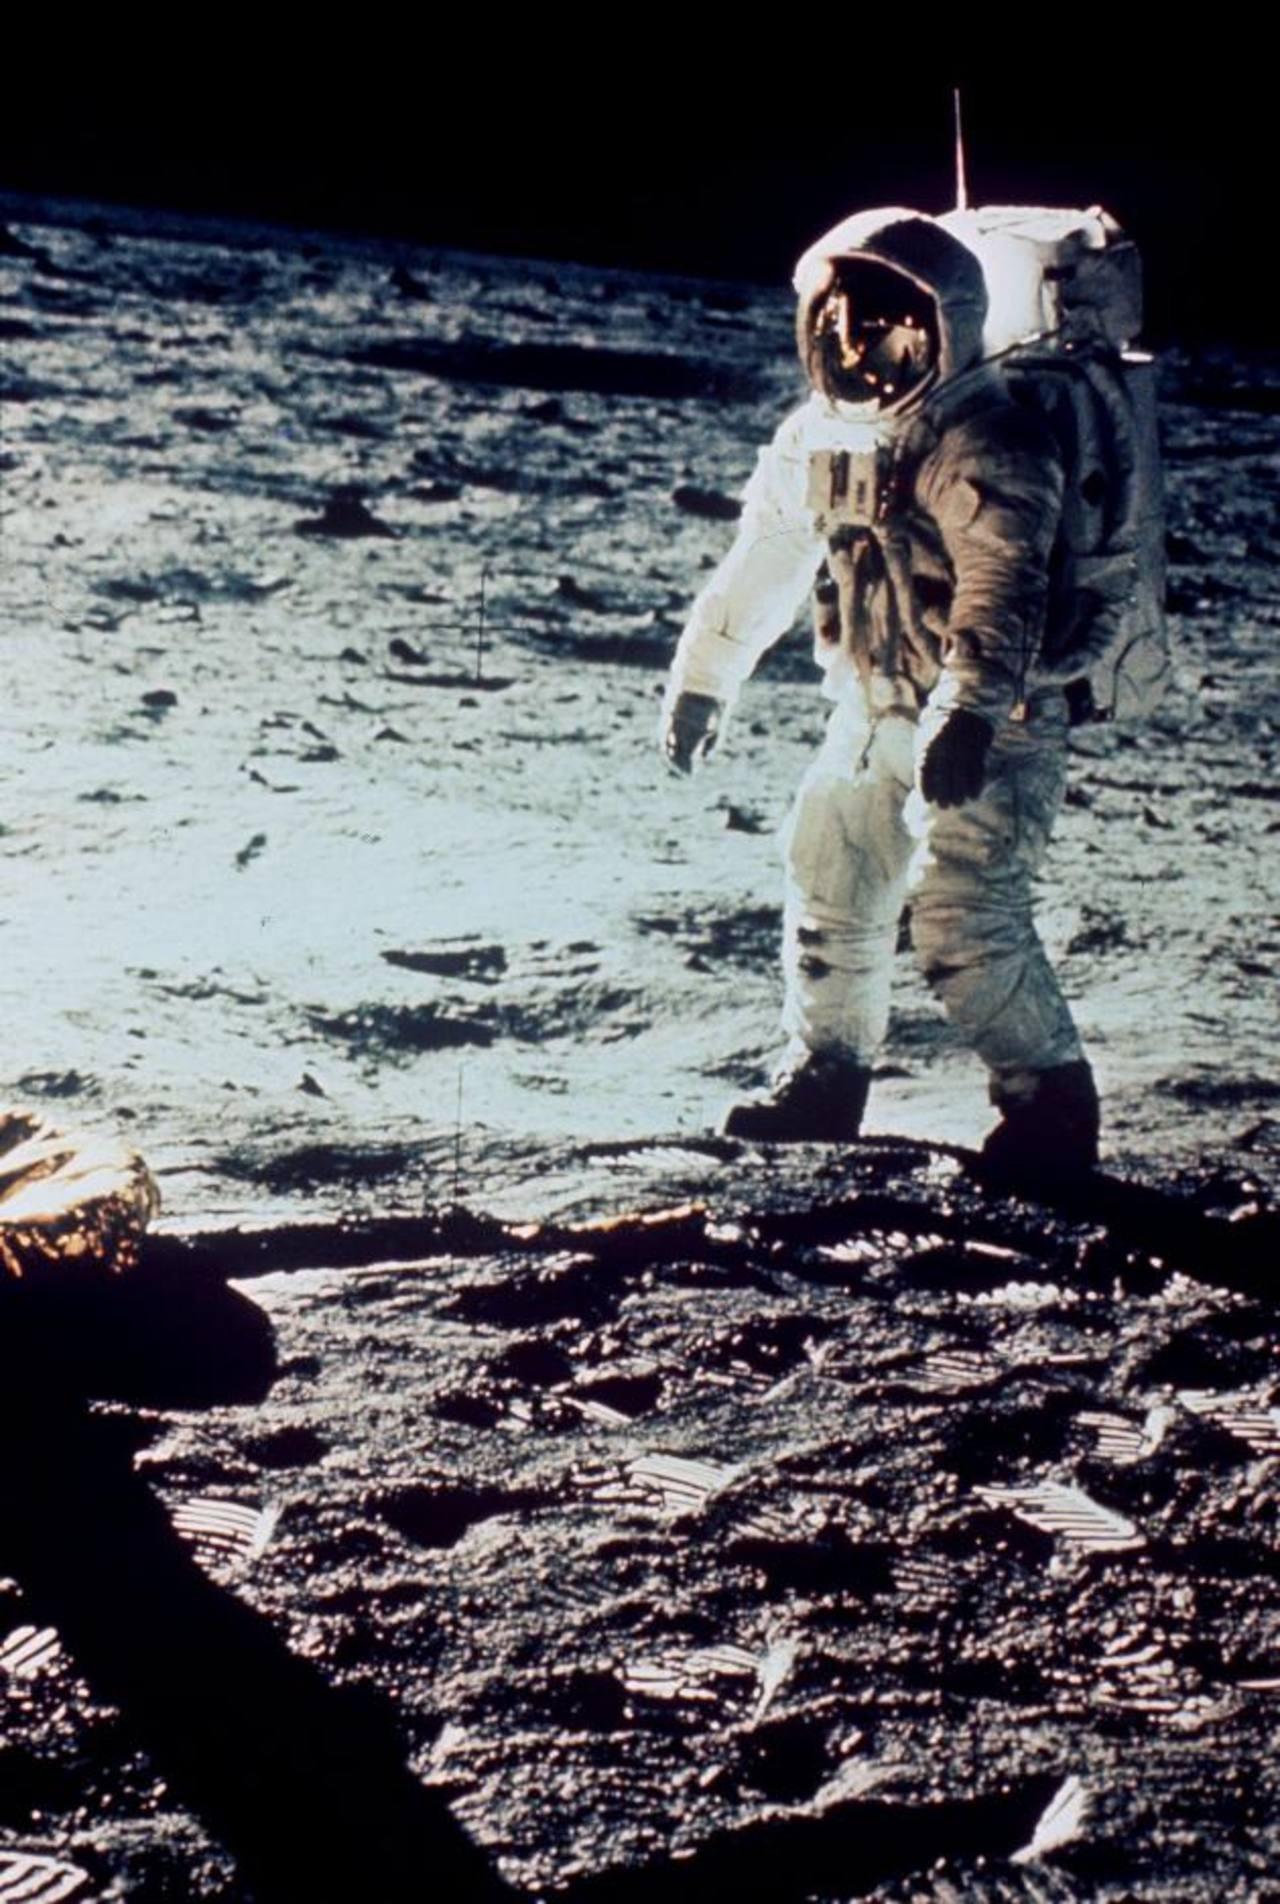 45 años de la llegada del hombre a la Luna